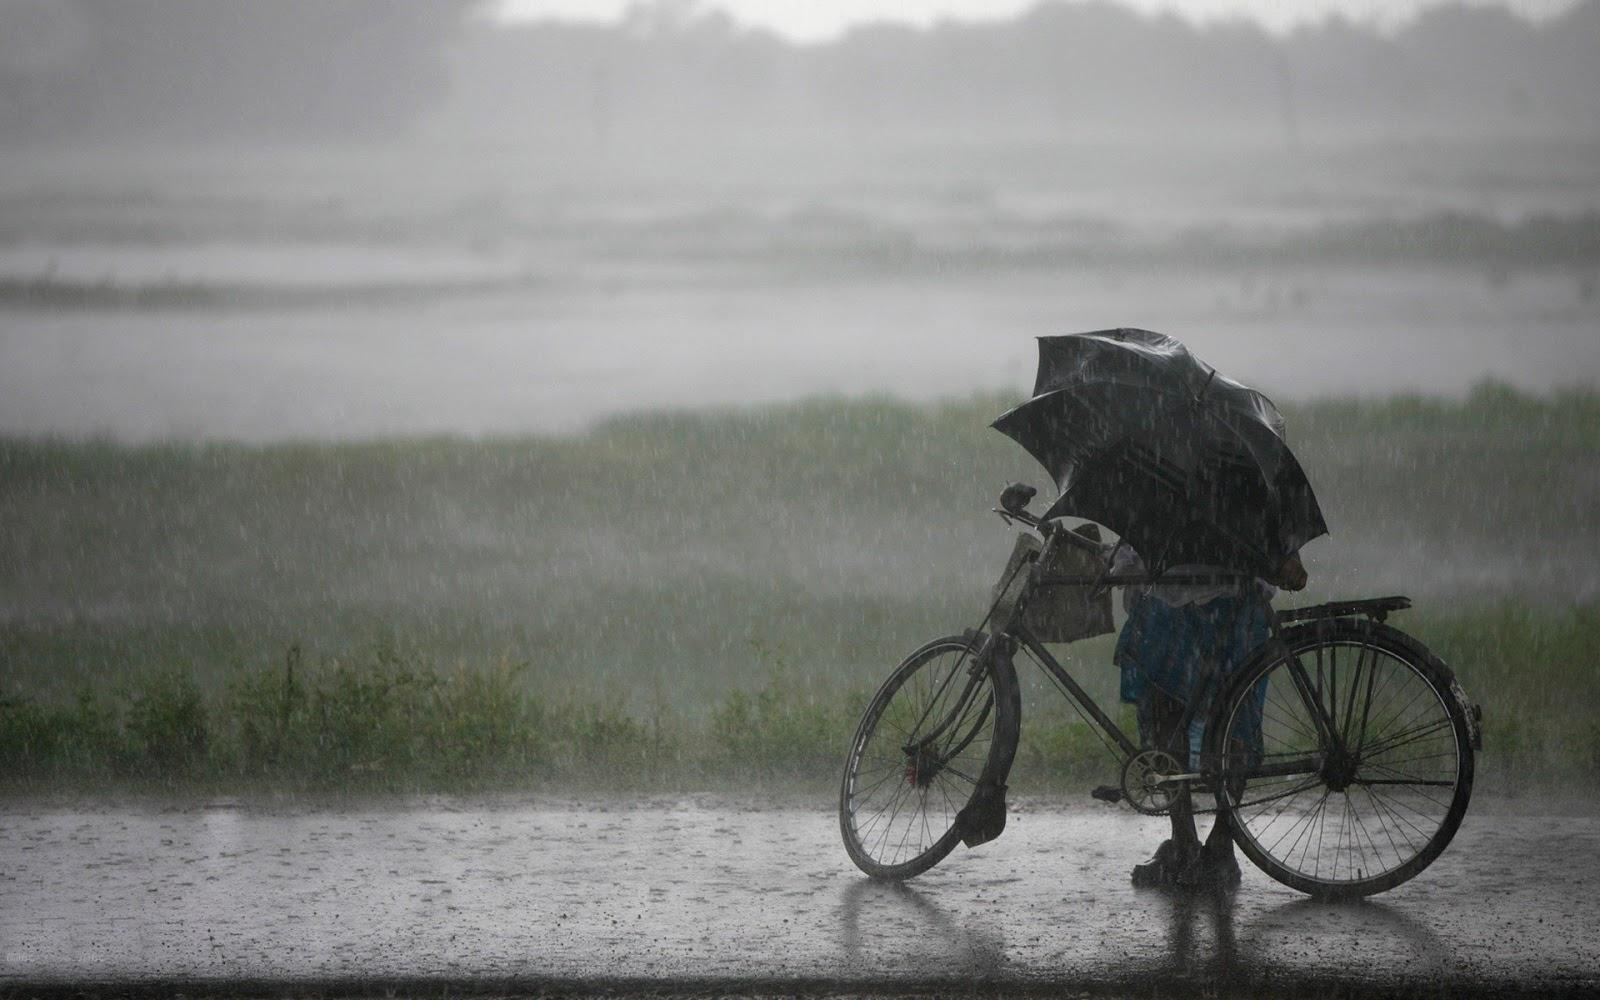 Rain Hd Images For Whatsapp